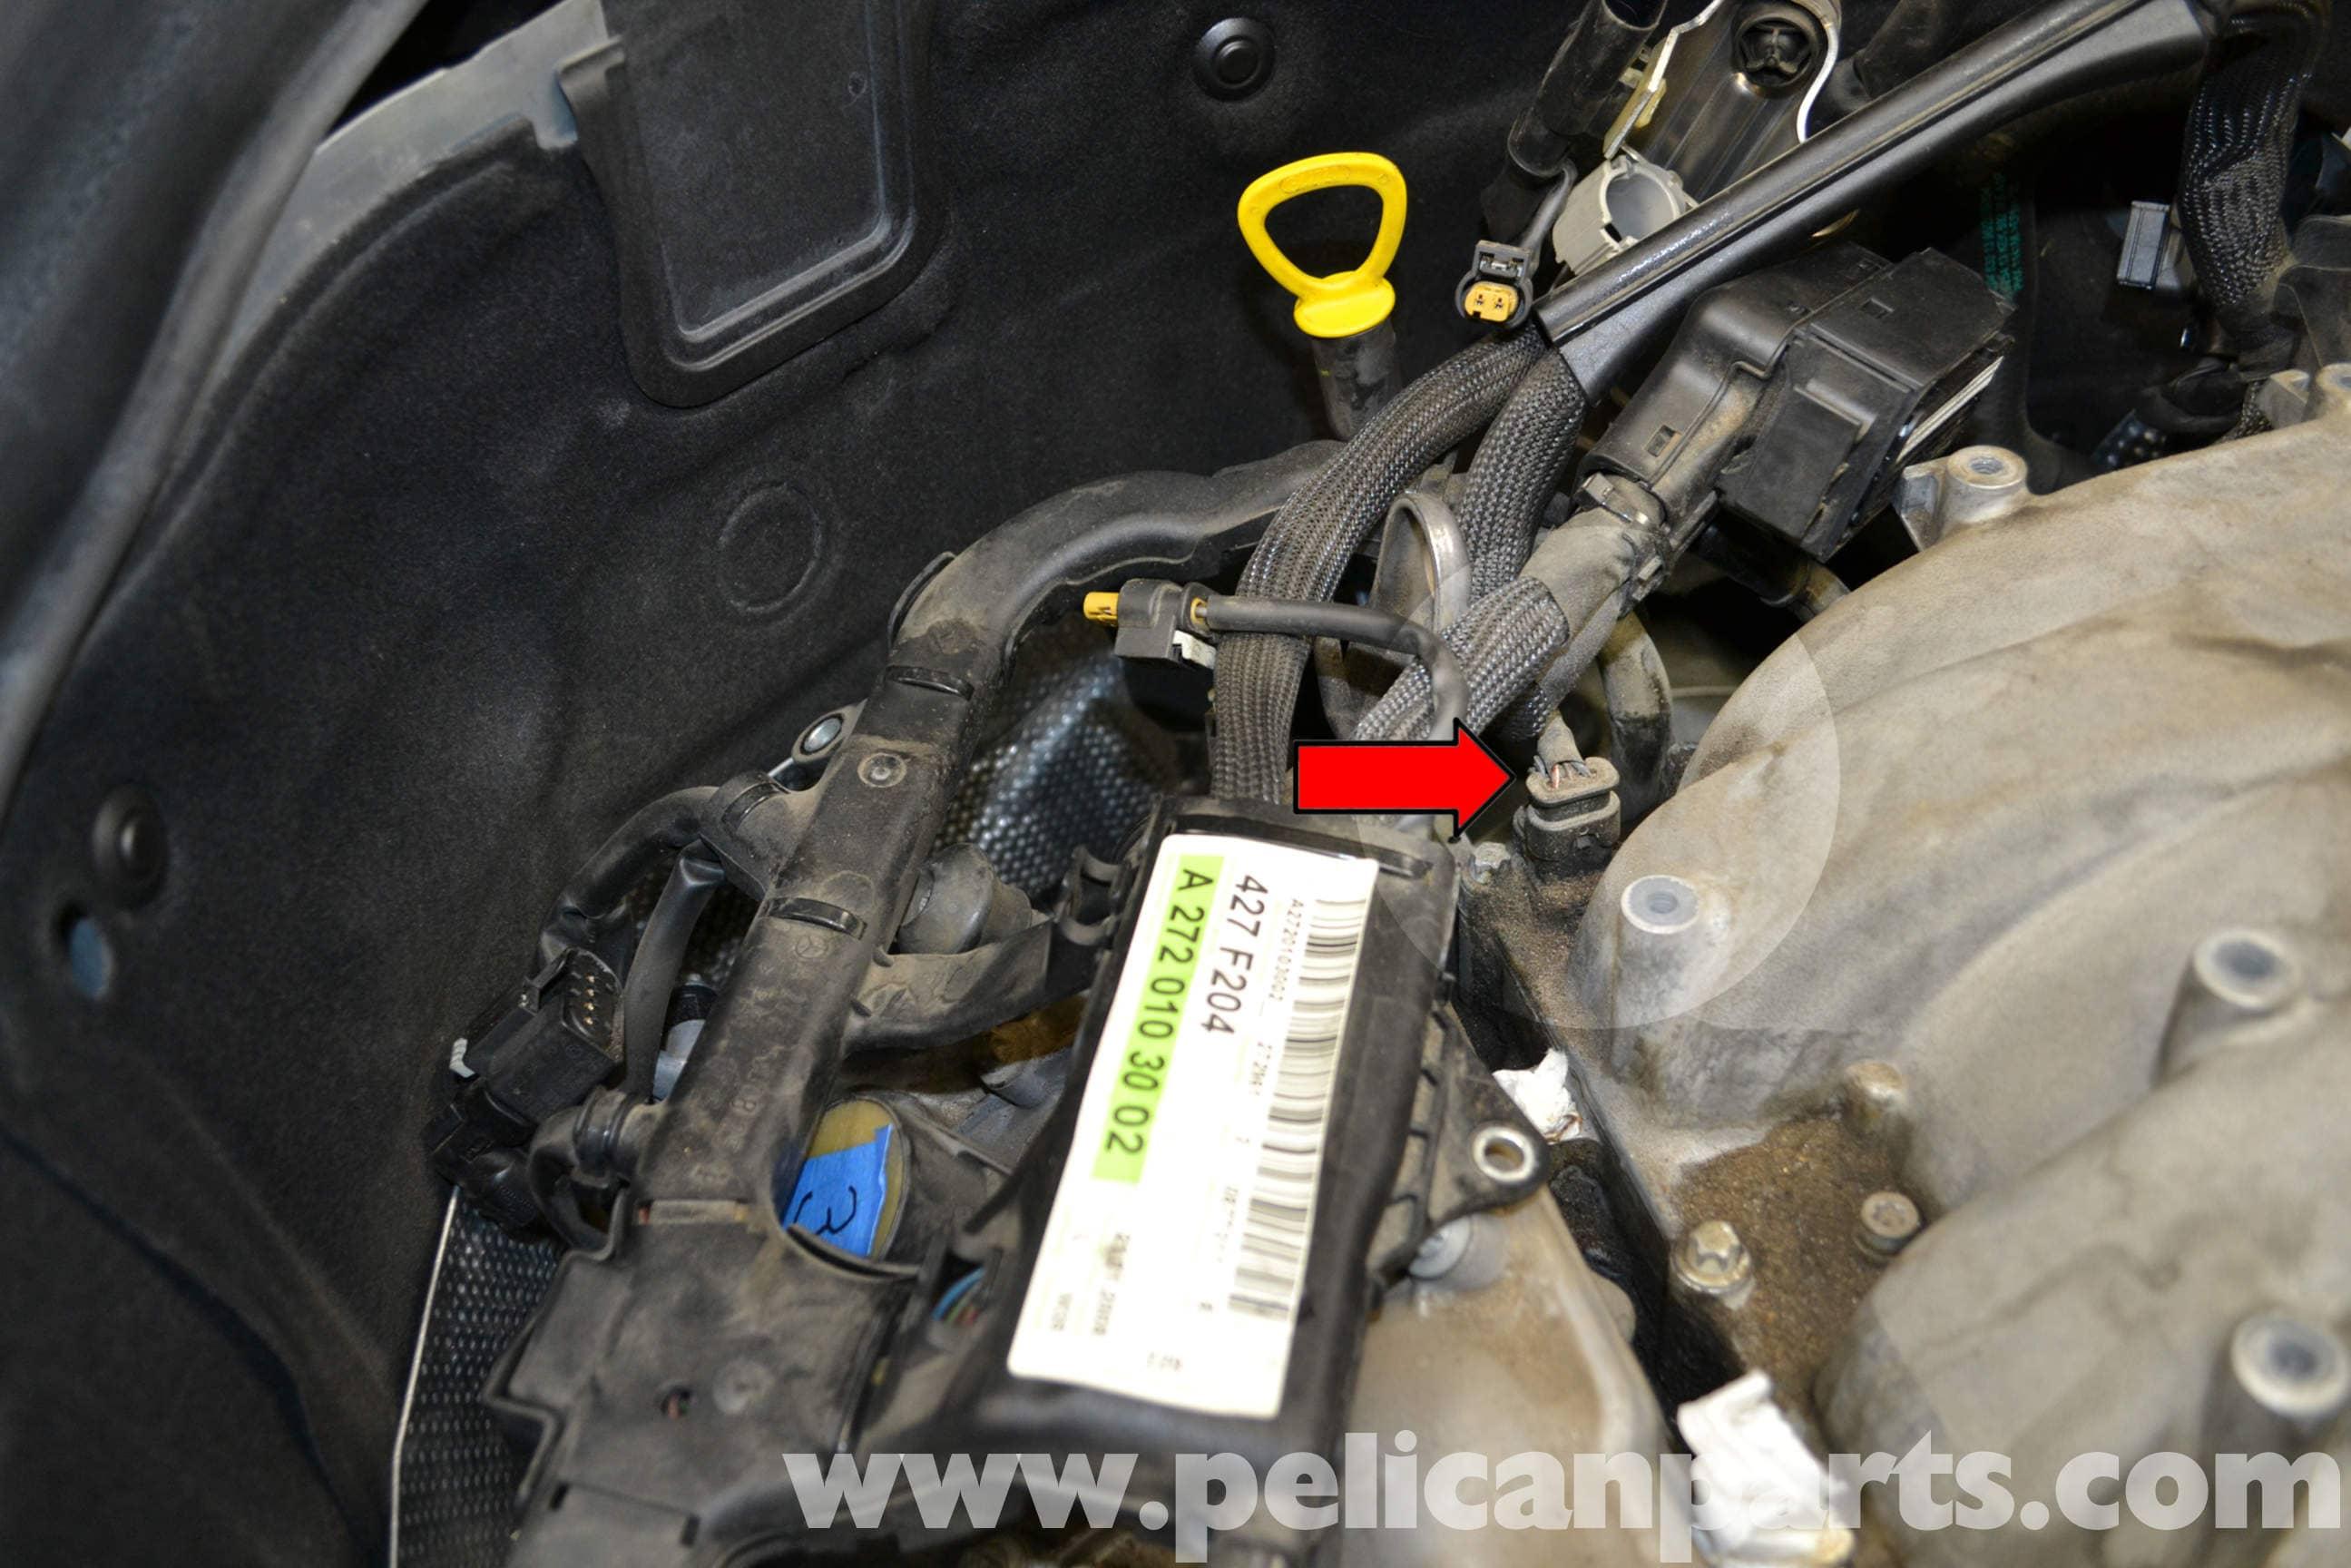 Mercedes benz w204 tumble flap position sensor replacement for Mercedes benz c300 engine